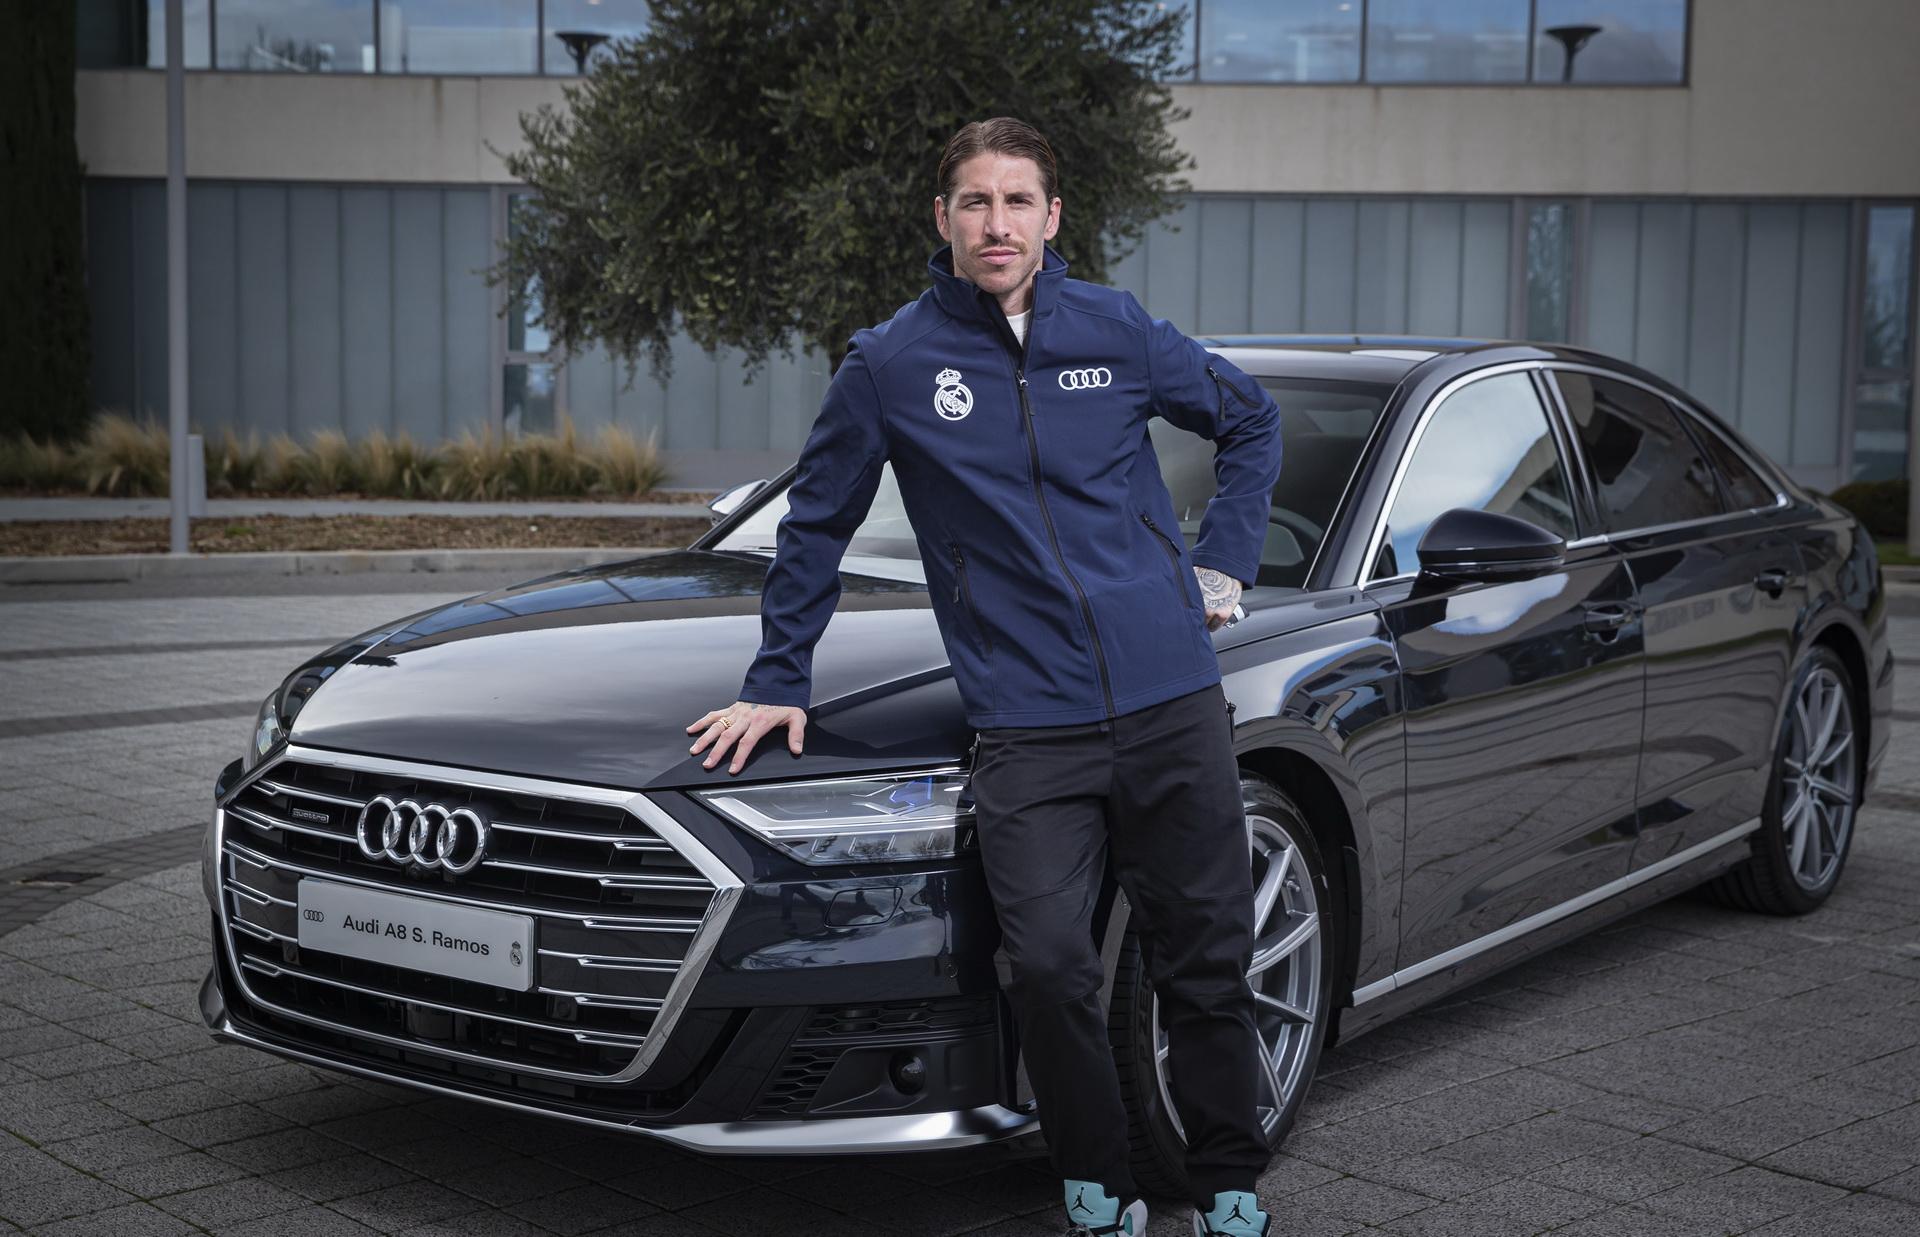 Real_Madrid_Players_Audi_0046